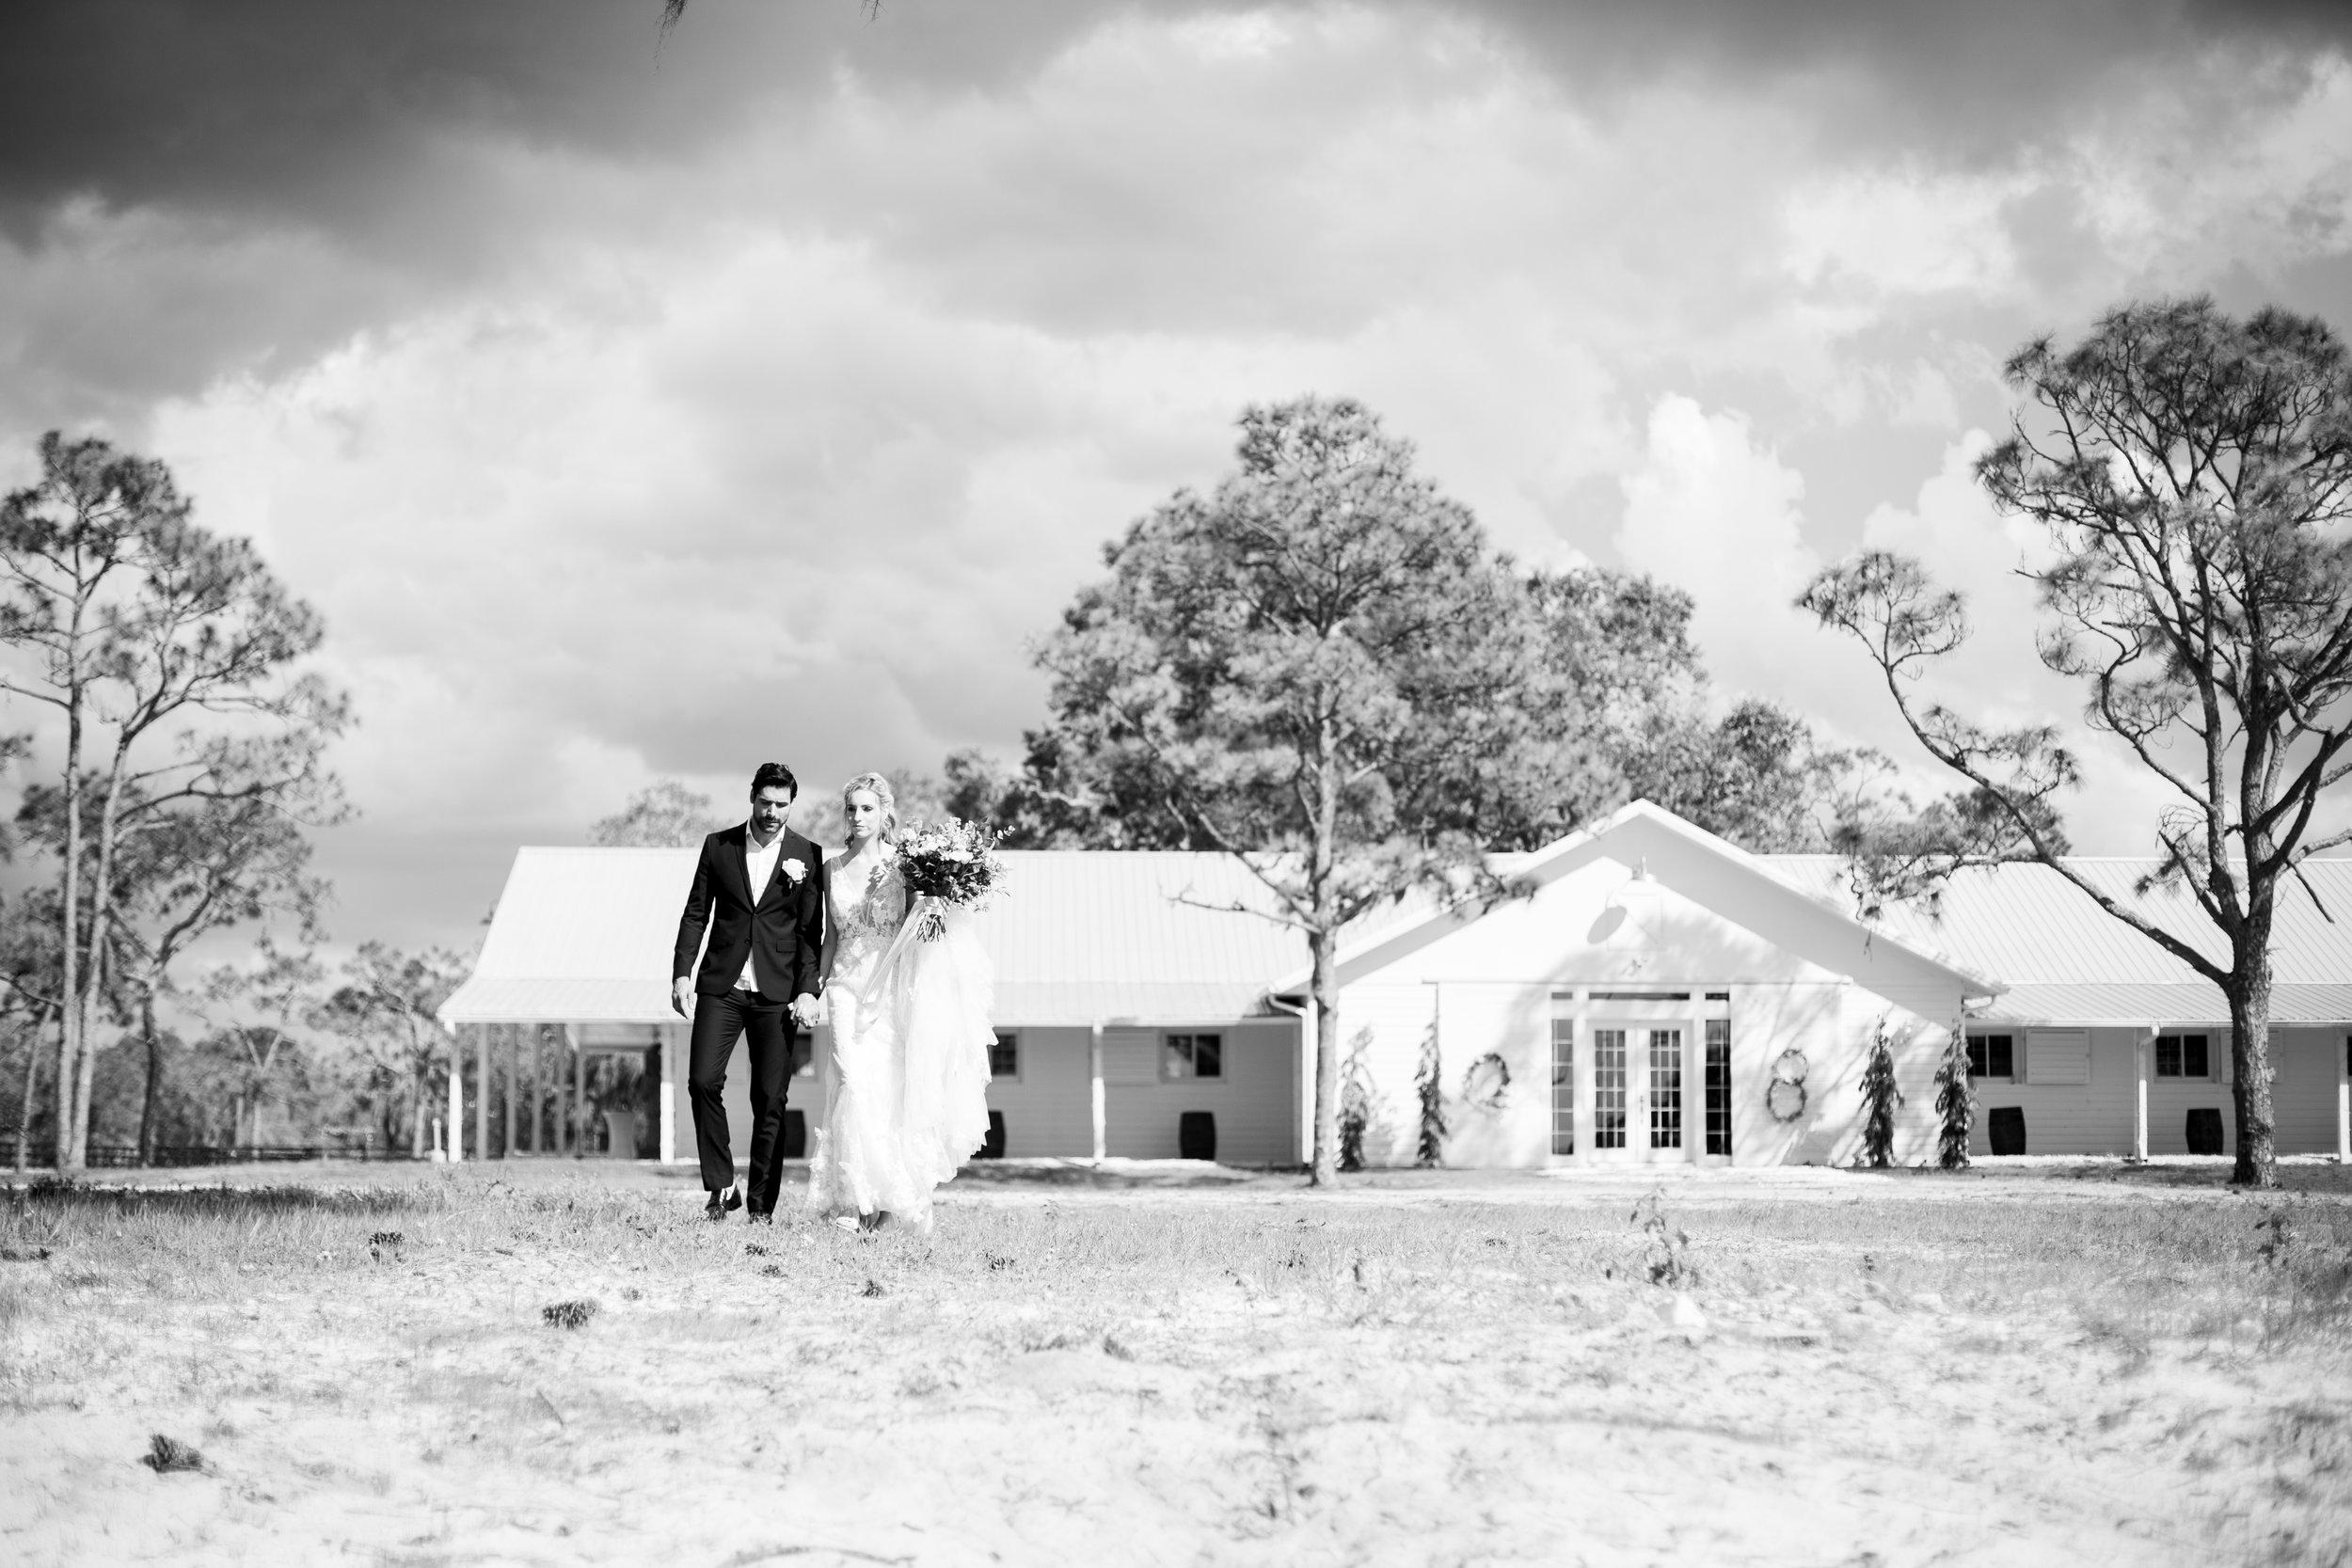 kelilina photography and films florida wedding photography videography 006-5.jpg